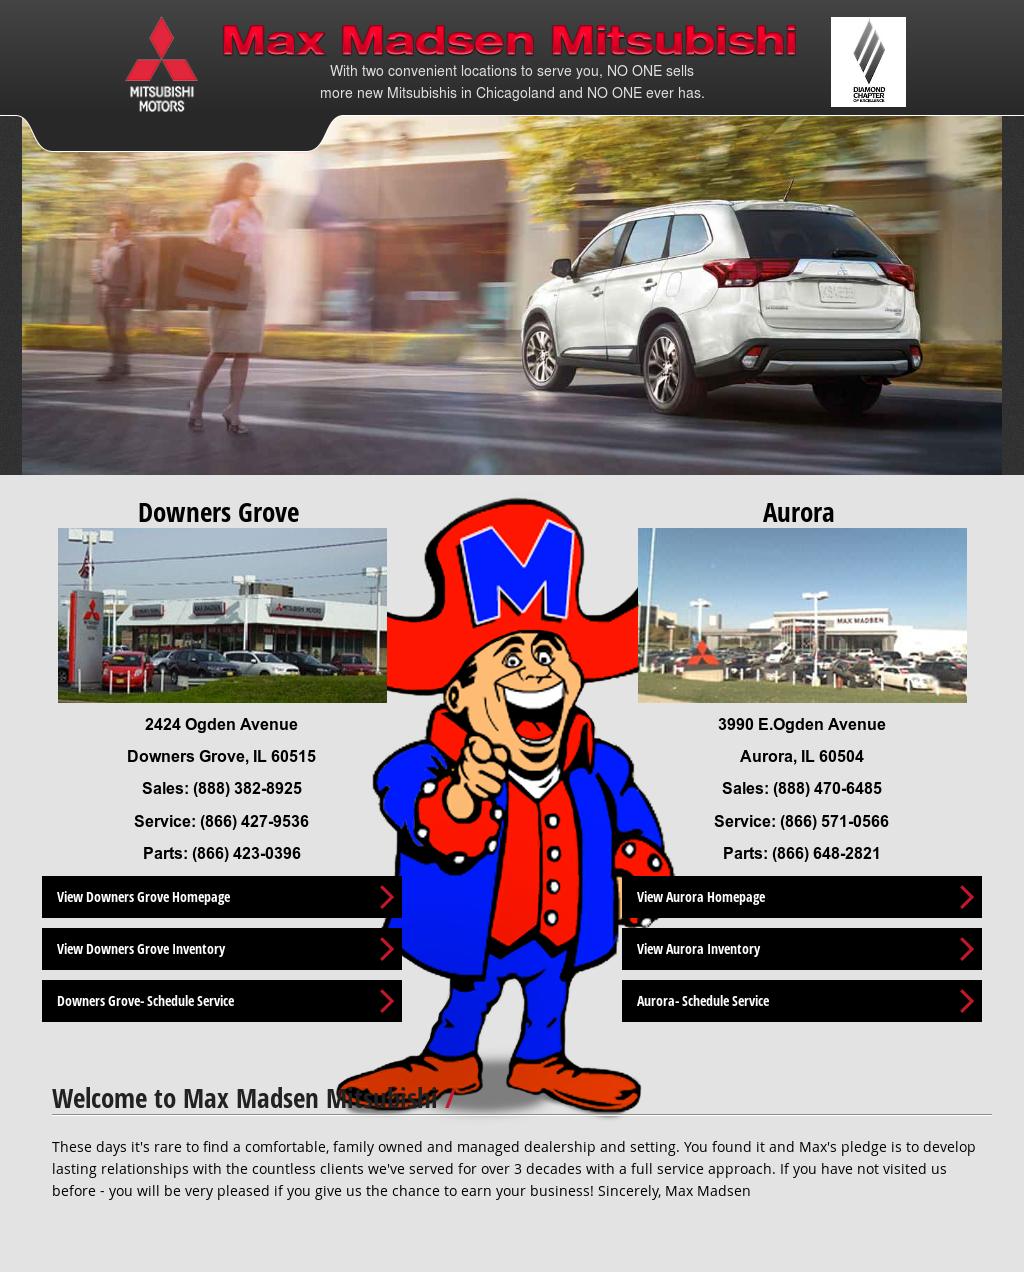 Max Madsen Mitsubishi Website History